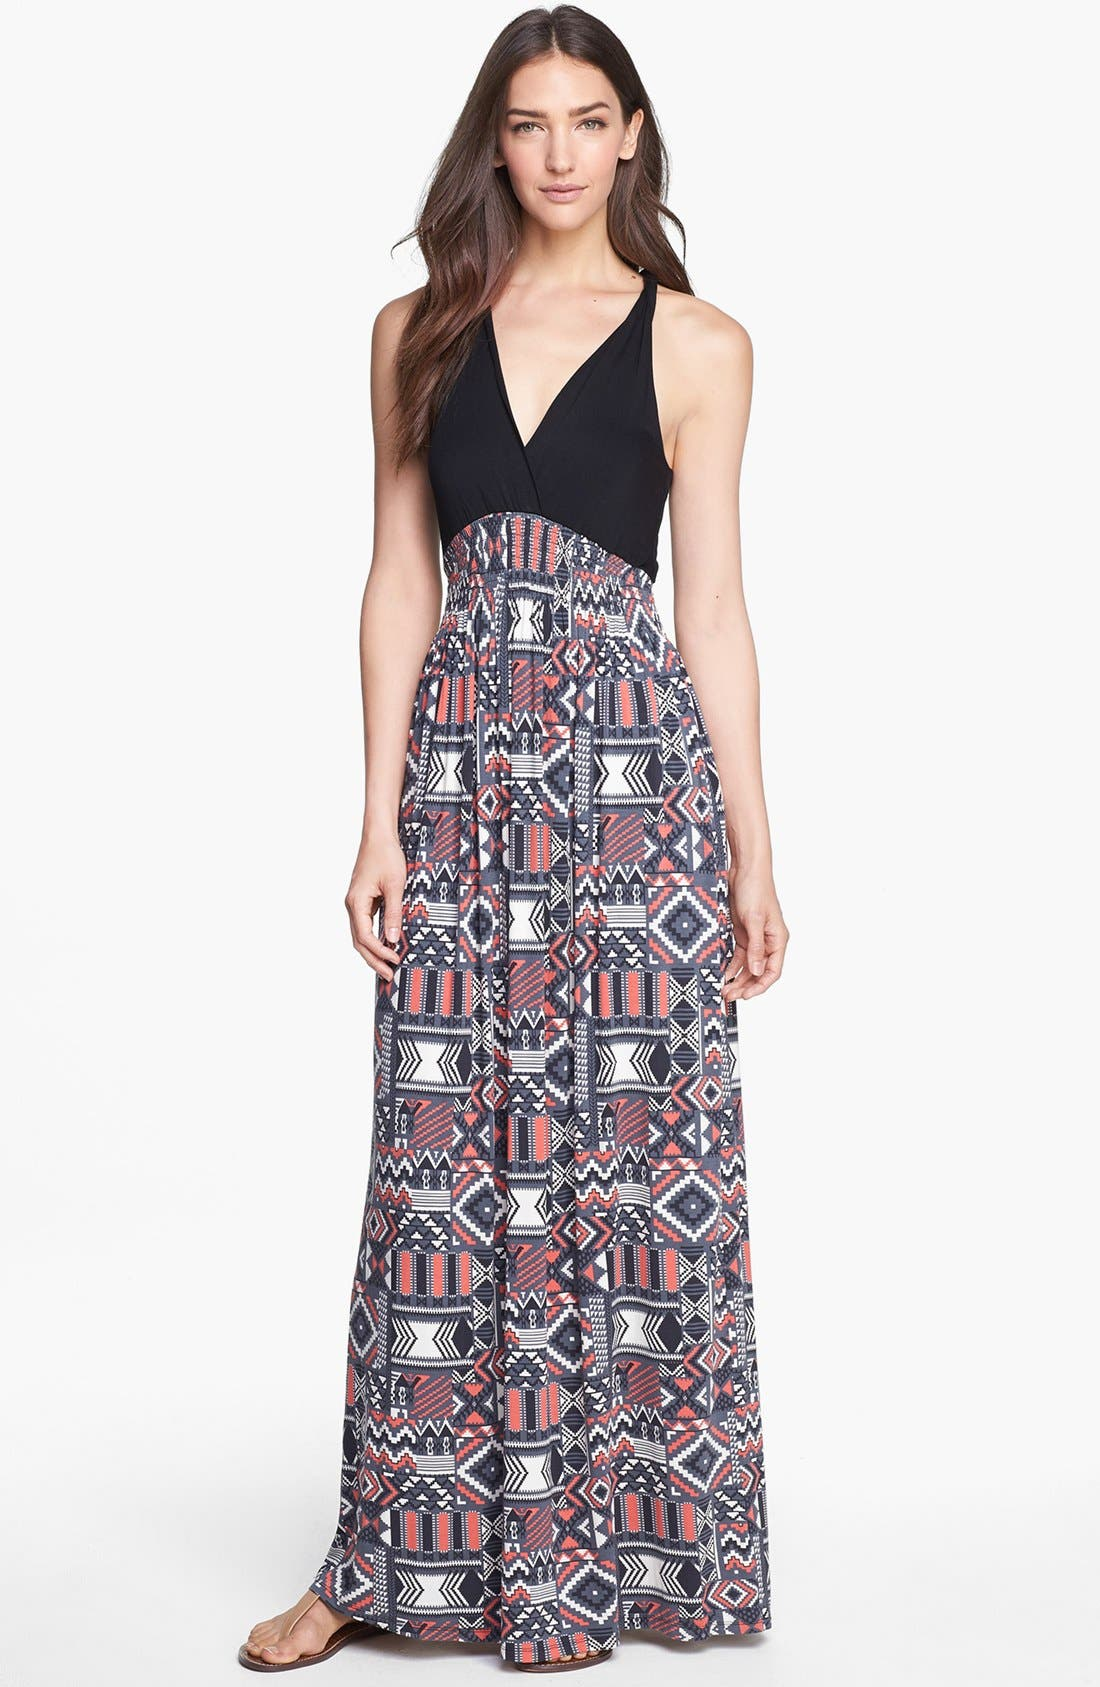 Main Image - Felicity & Coco Printed Maxi Dress (Regular & Petite) (Nordstrom Exclusive)